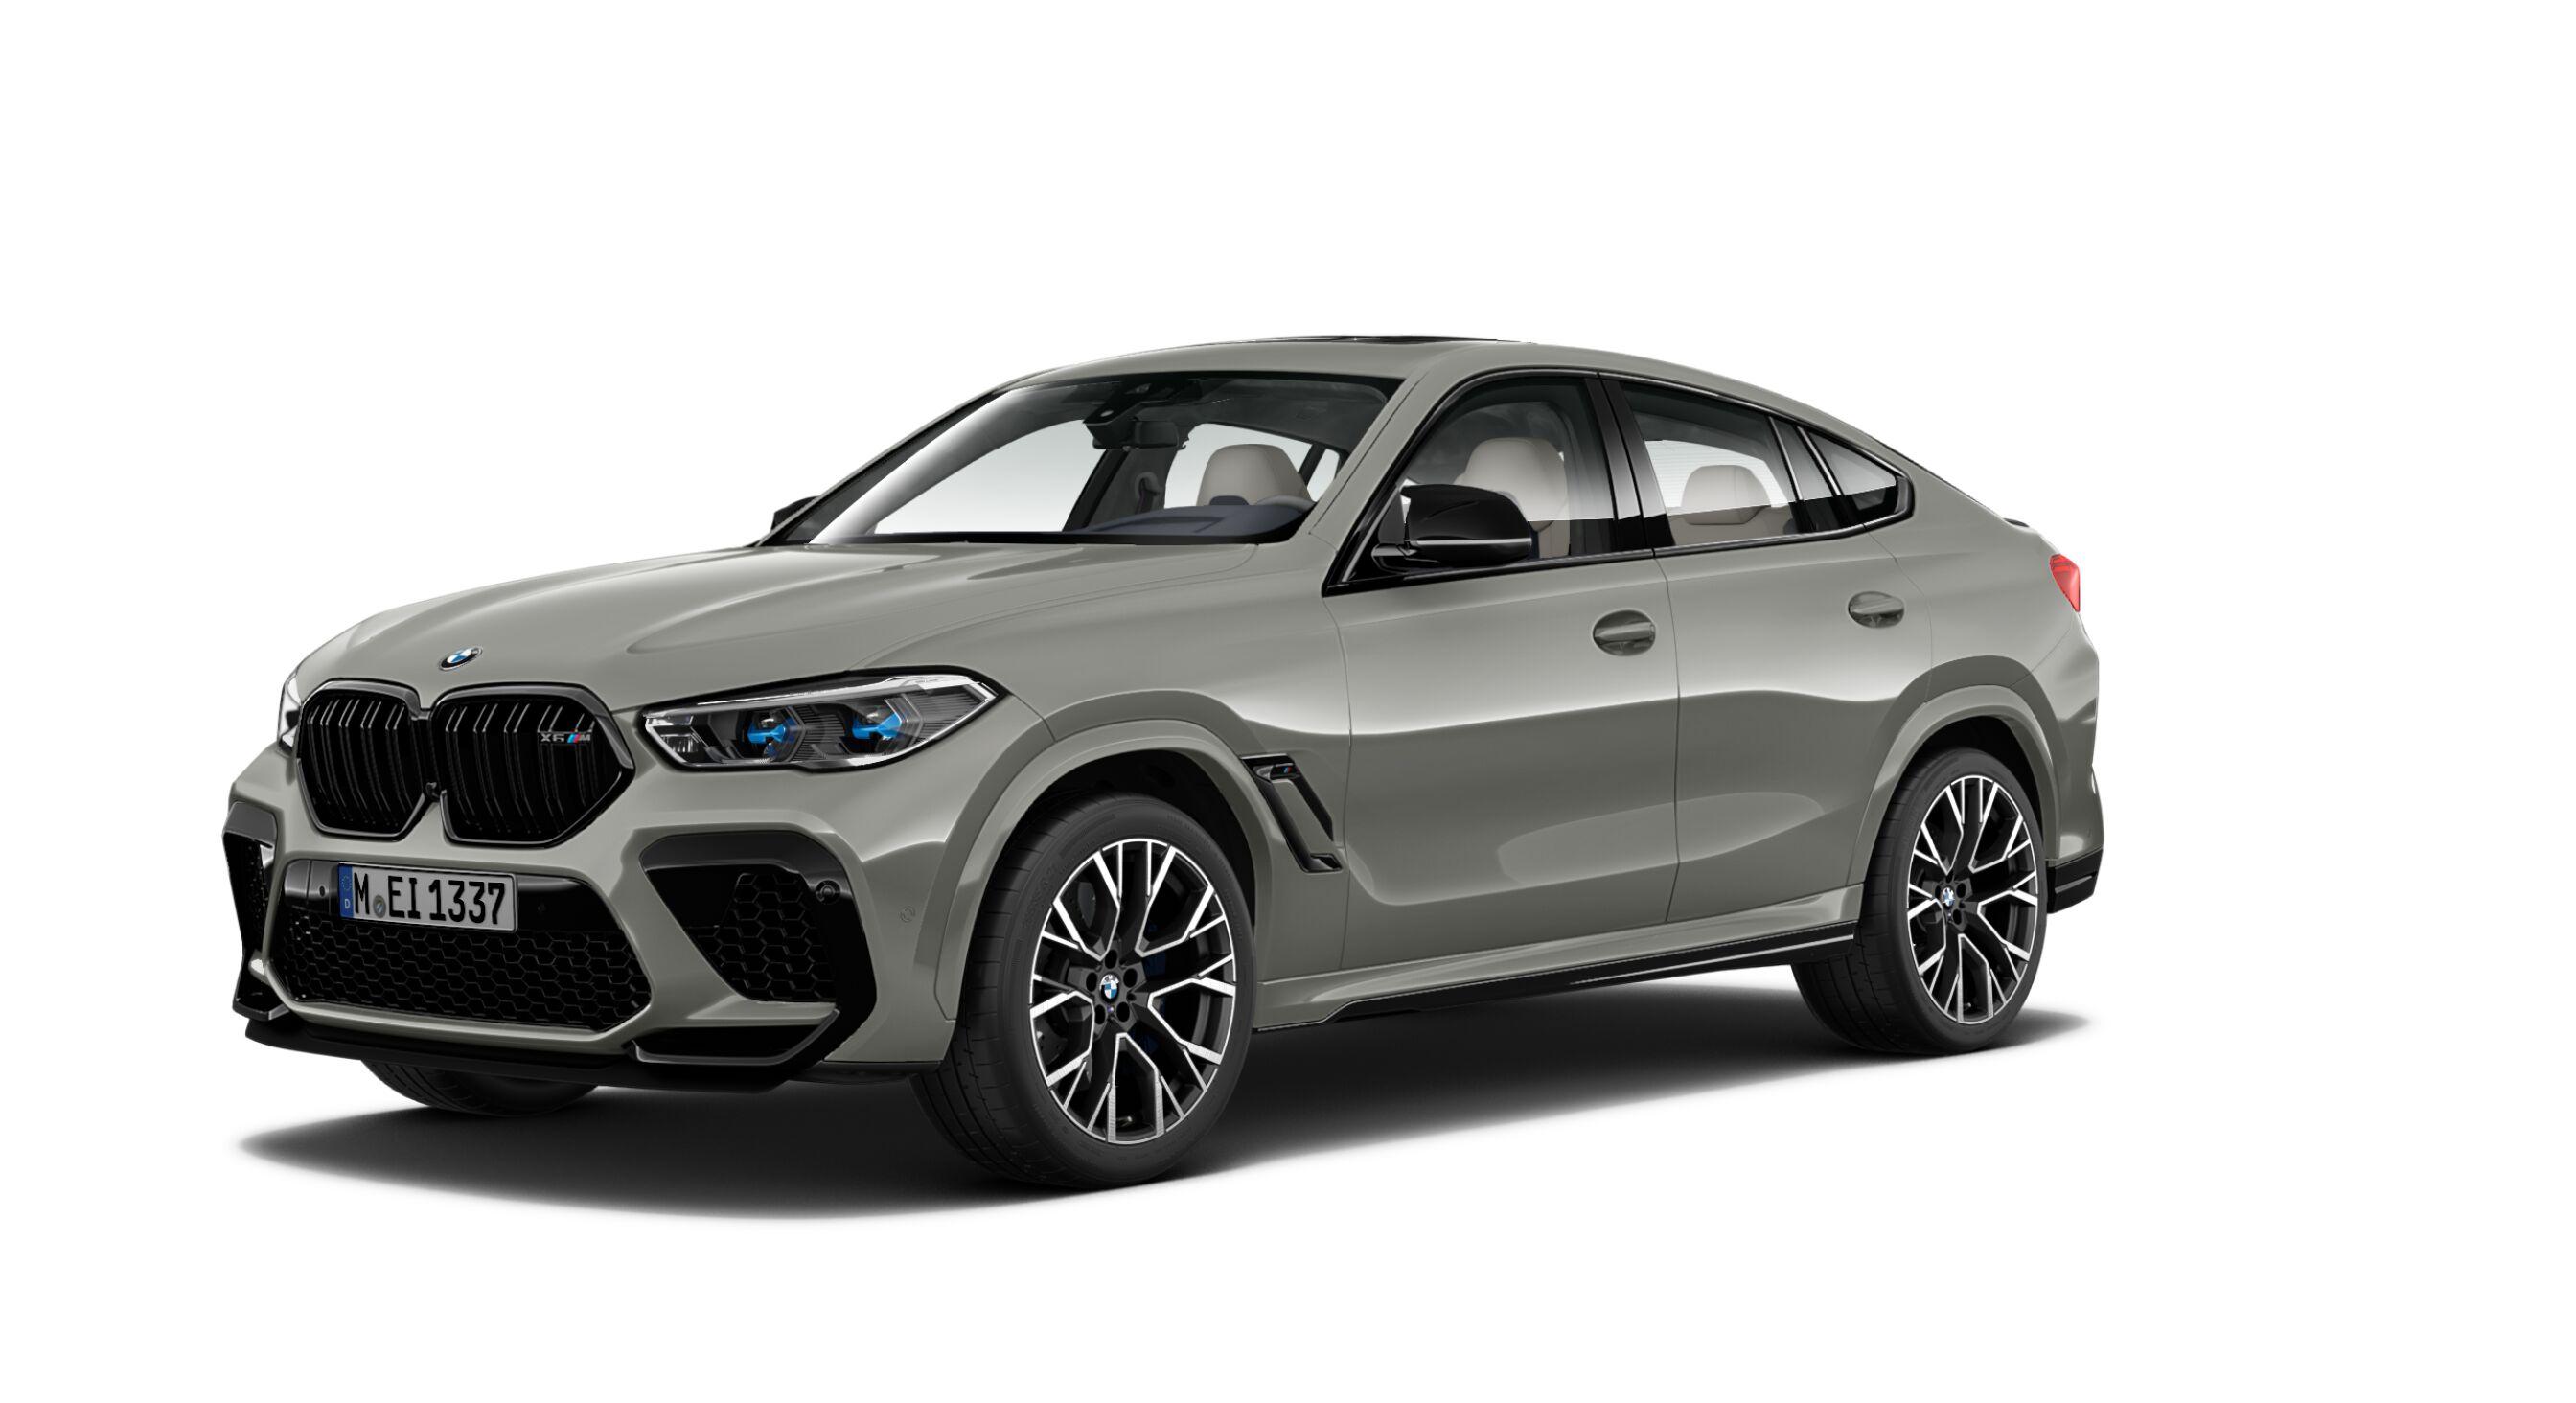 BMW X6 M Competition F96 Donington Gray 2